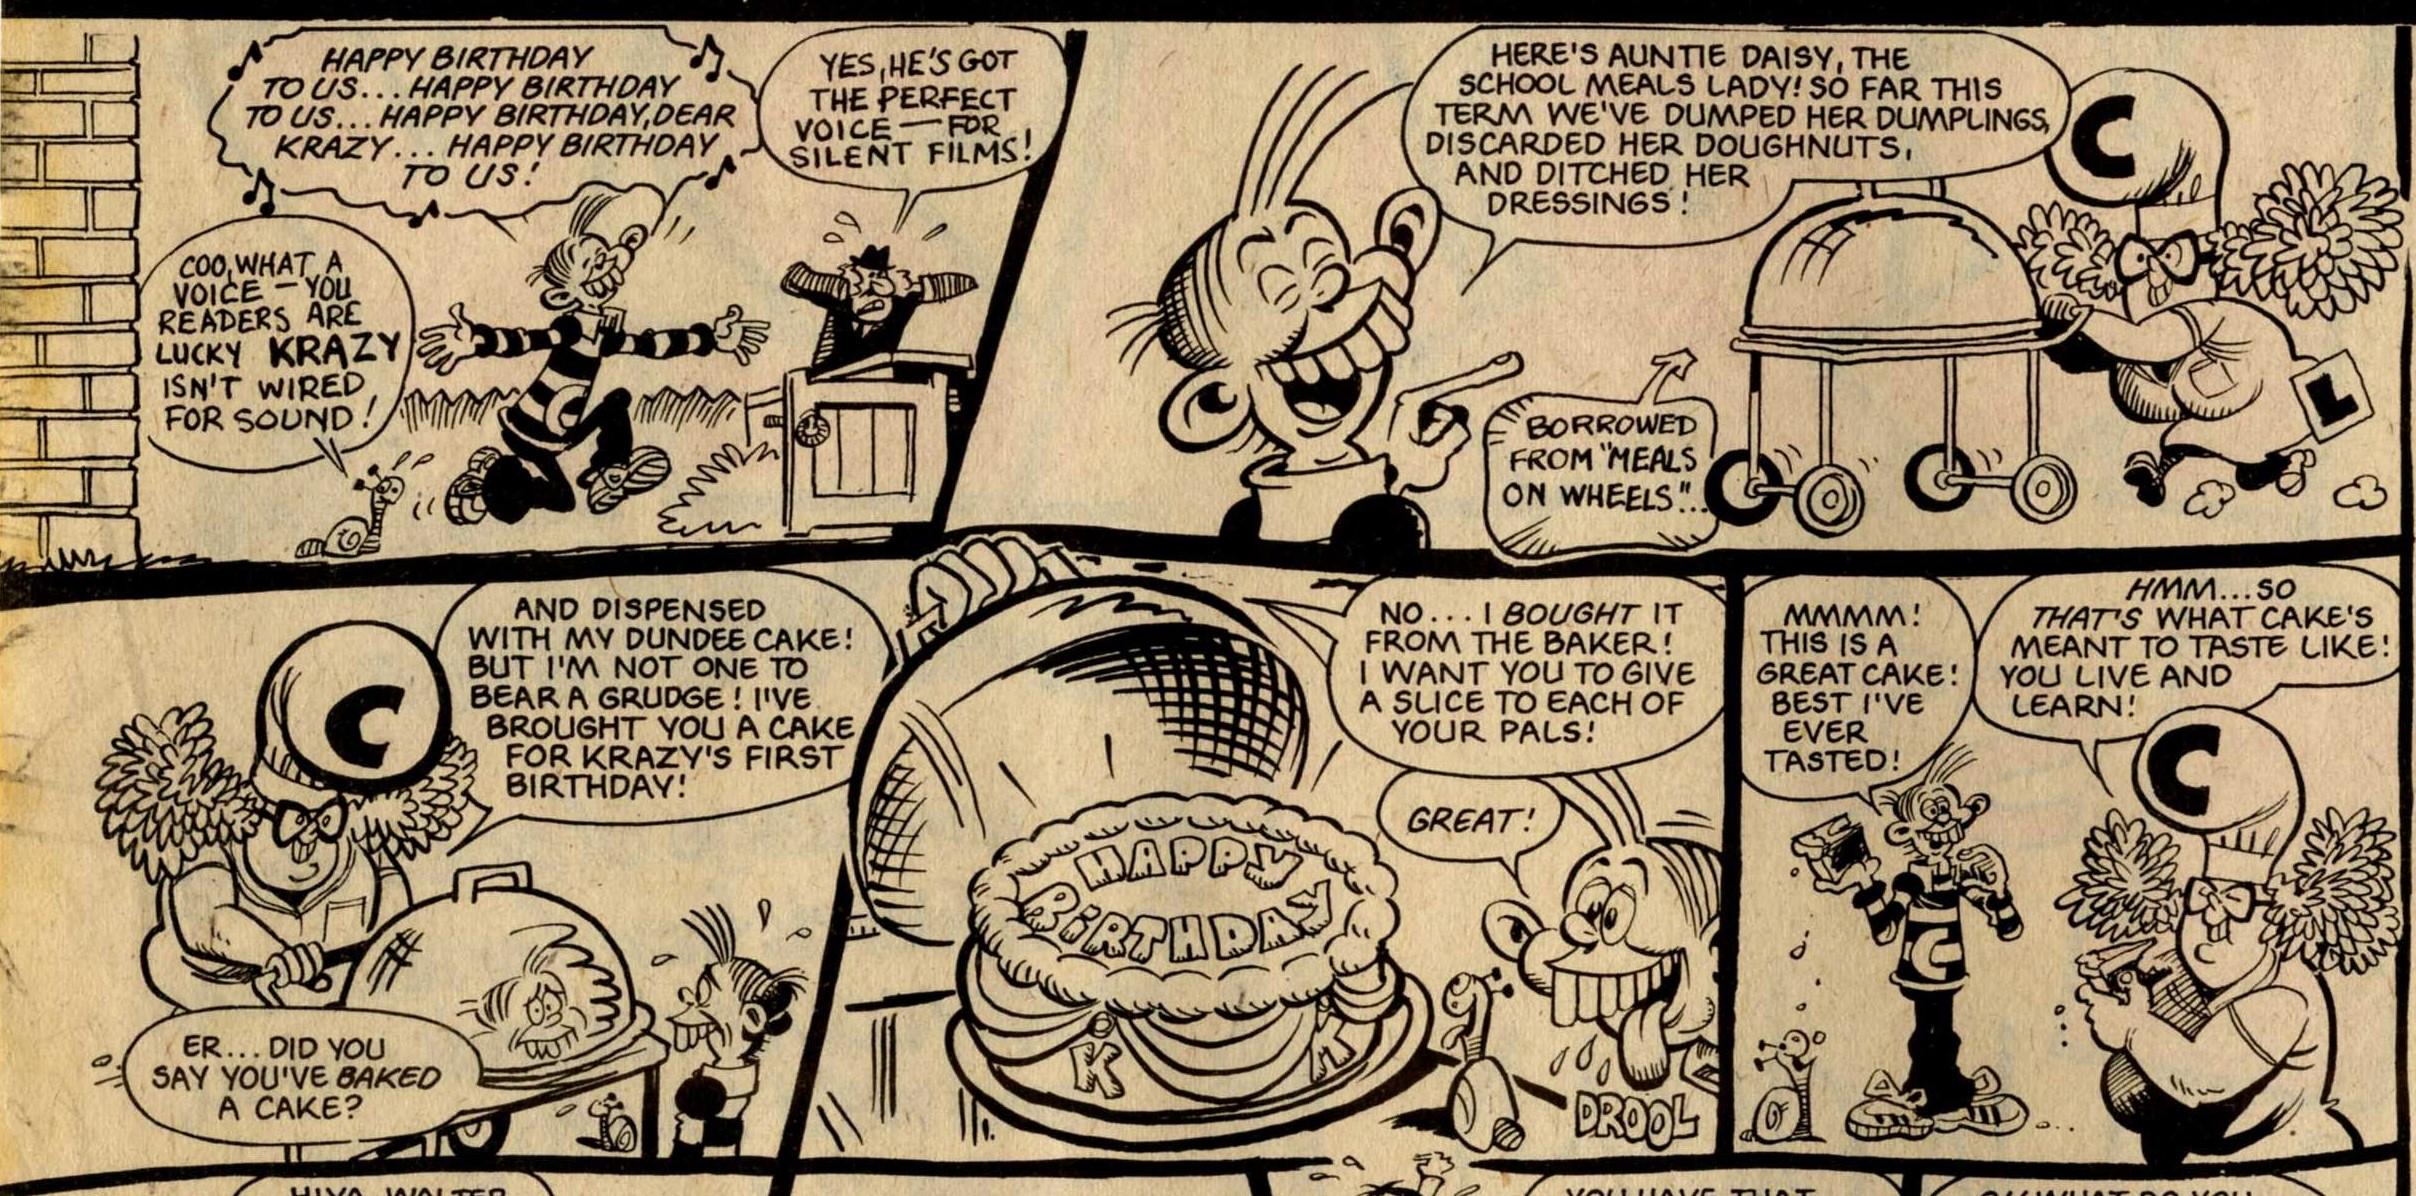 'Ello, It's Cheeky: Frank McDiarmid (artist)